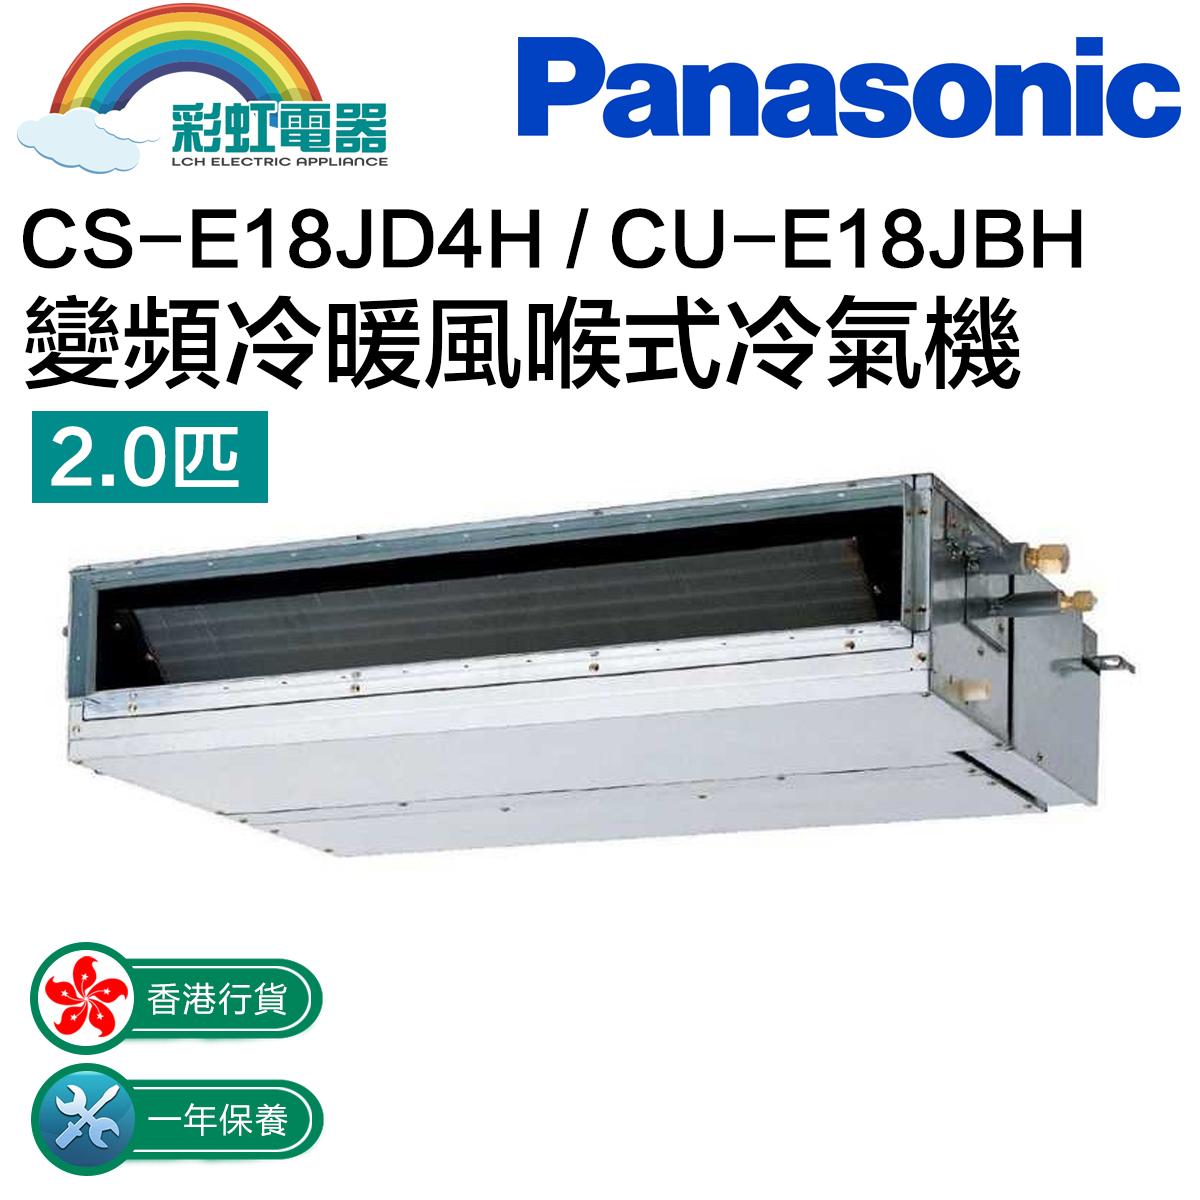 CS-E18JD4H/CU-E18JBH 2.0匹 變頻冷暖低壓風喉式冷氣機